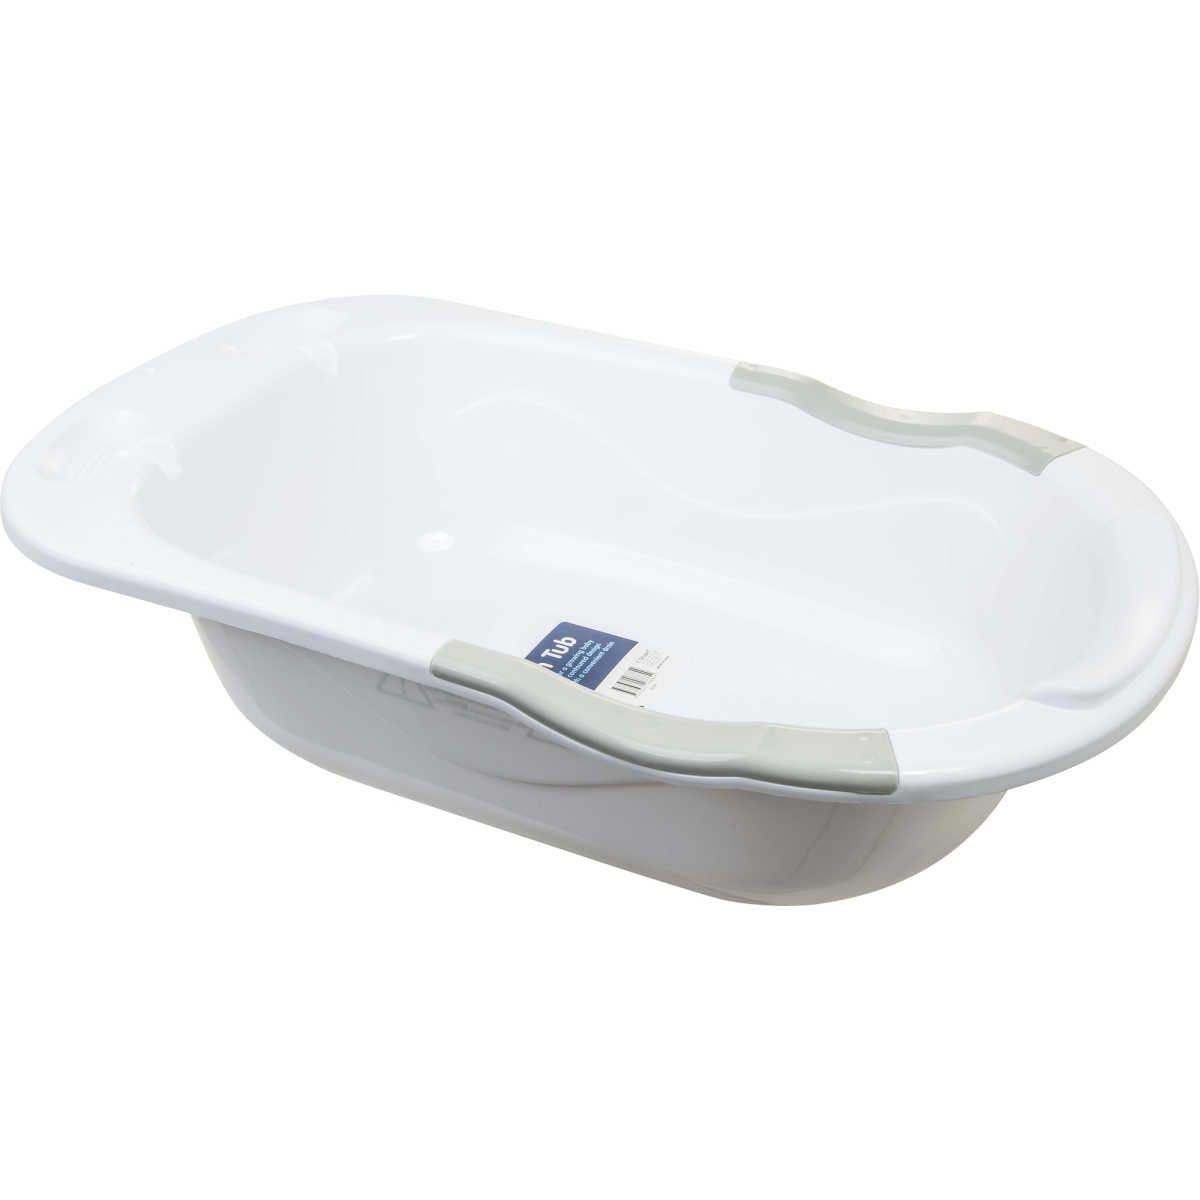 Big Softies Baby Bath Tub | Pinterest | Softies, Bath tubs and Baby ...